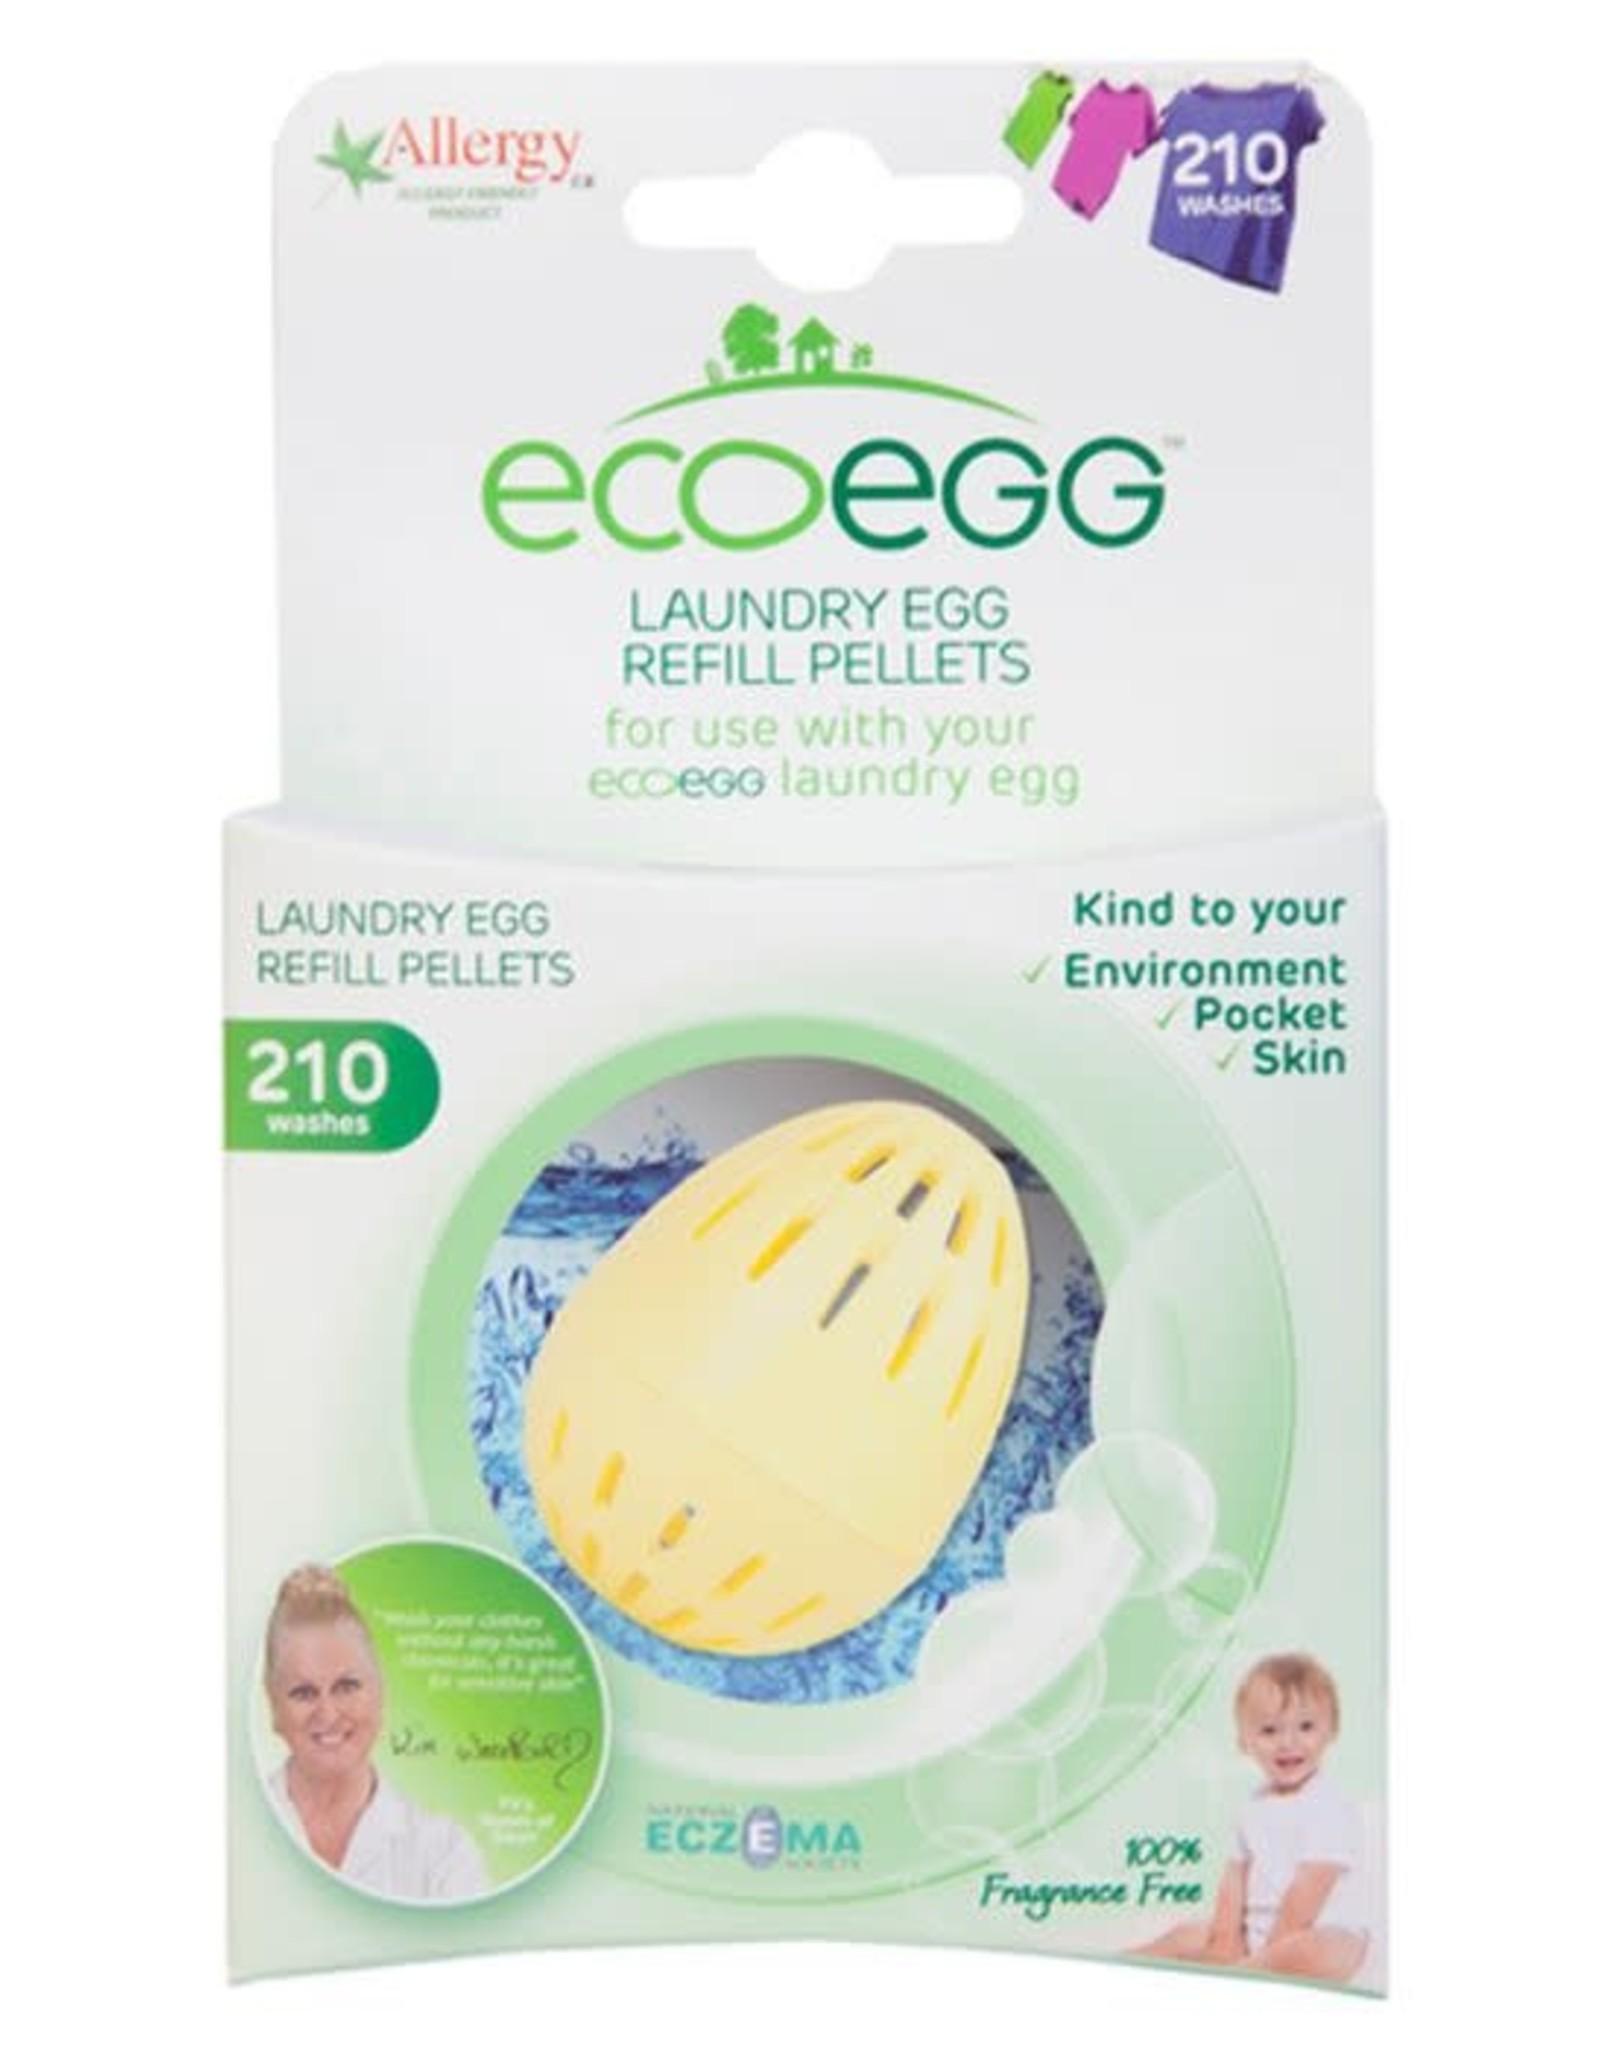 Ecoegg ecoegg Laundry Egg Refill Pellets Fragrance free 210 washes